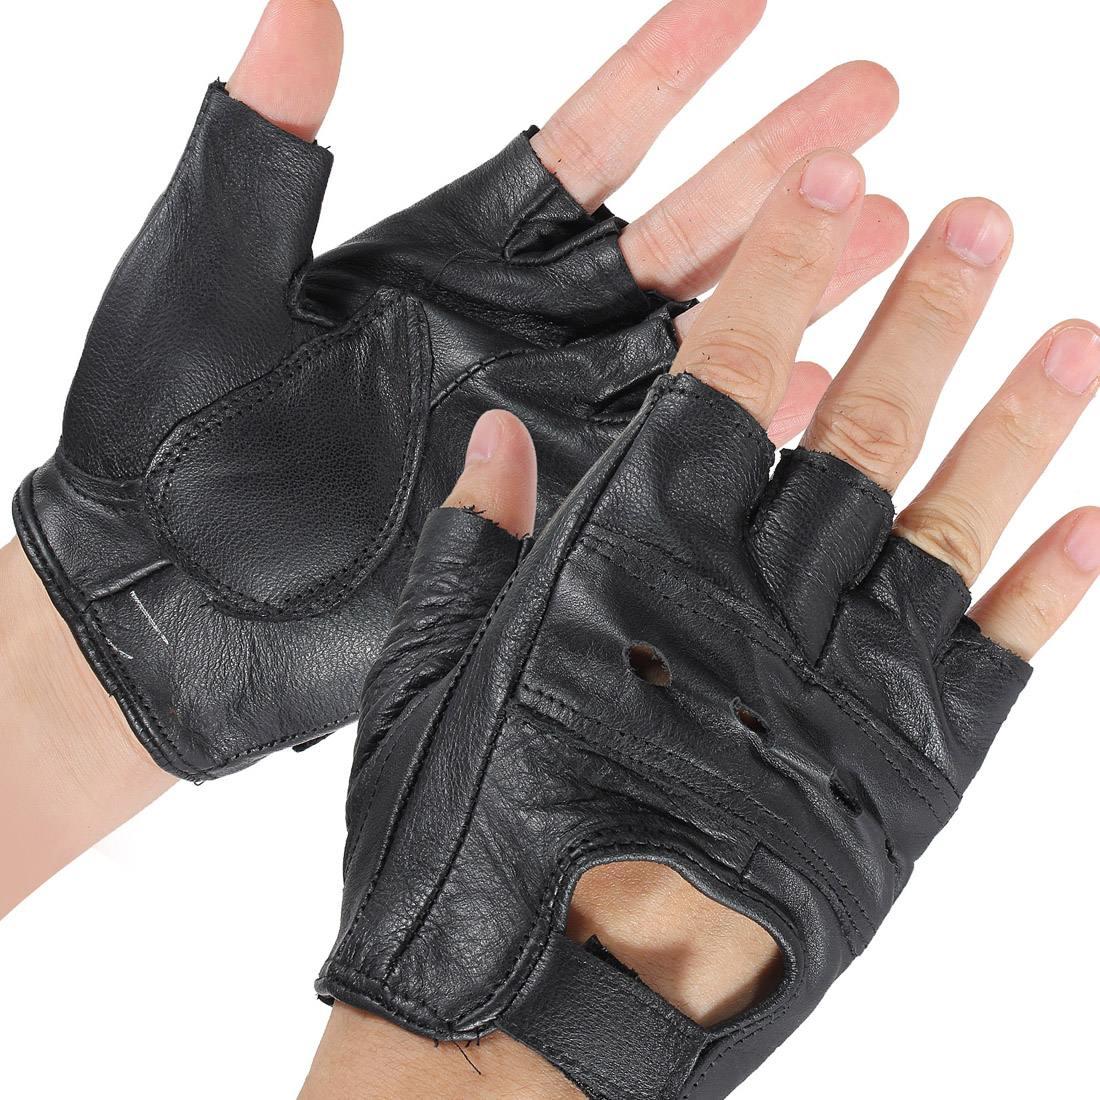 2pcs M Black Medium Fingerless Leather Motorcycle Glove Vented Cowhide Multi-use Half Finger Leather